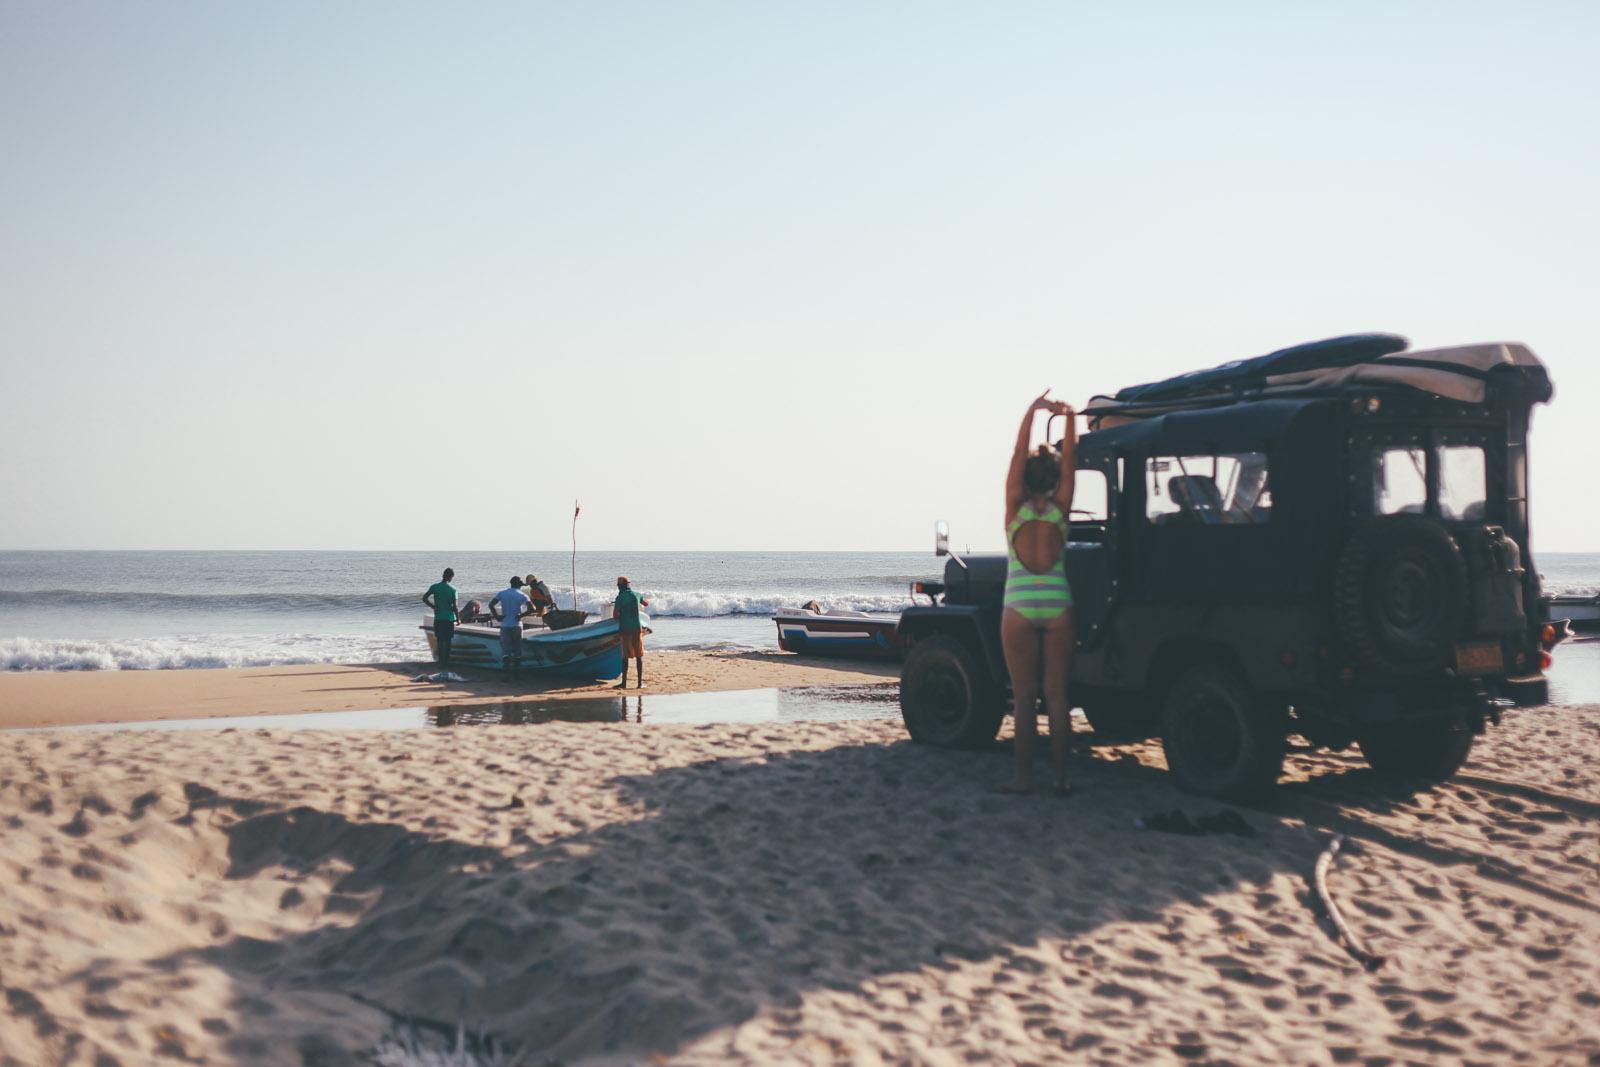 Sunshinestories-surf-travel-blog-IMG_3197